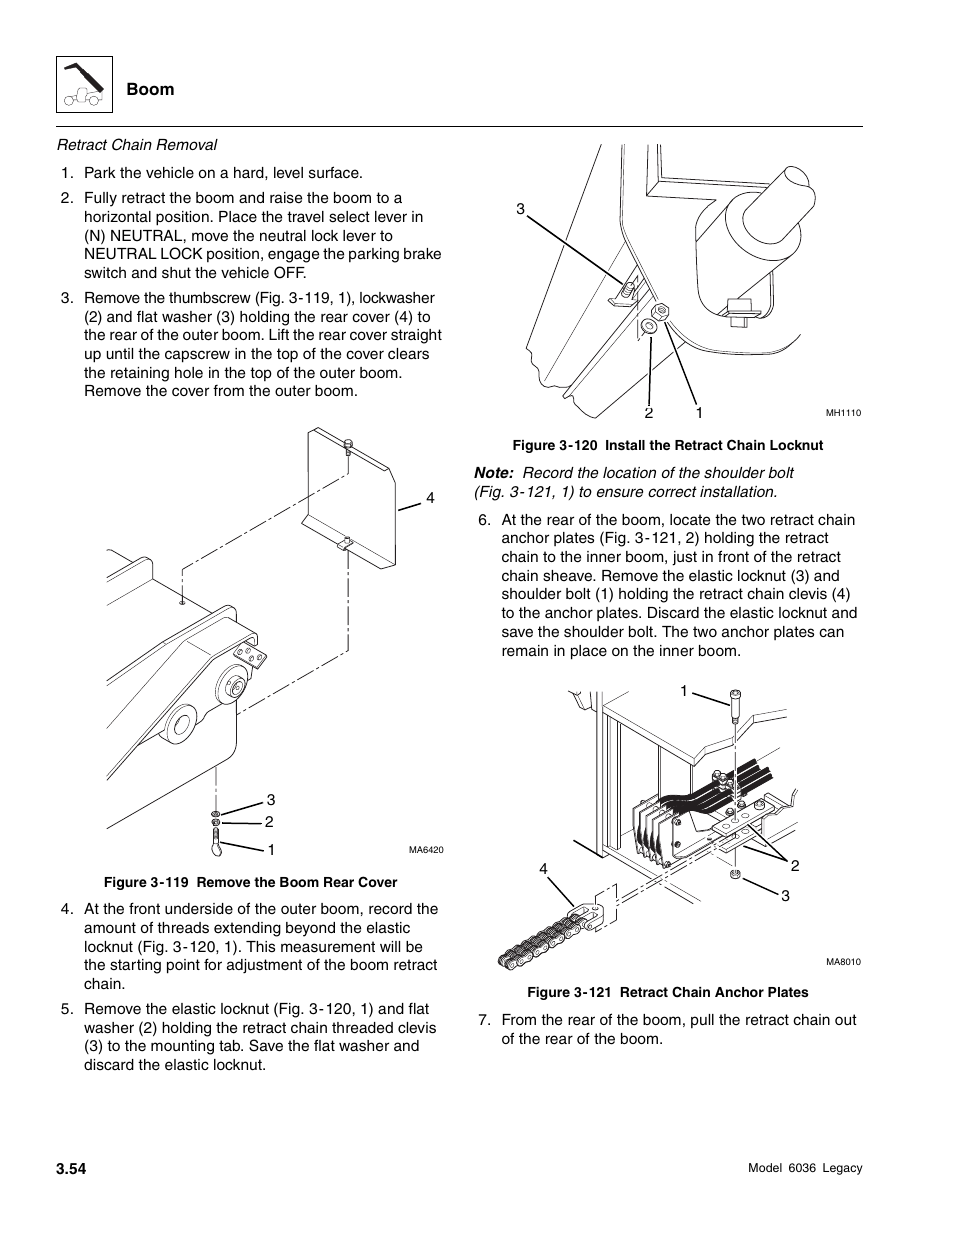 Jlg Scissor Lift Wiring Diagram Block Explanation Skytrak 6036 Diagrams Schemes 1930es Boom